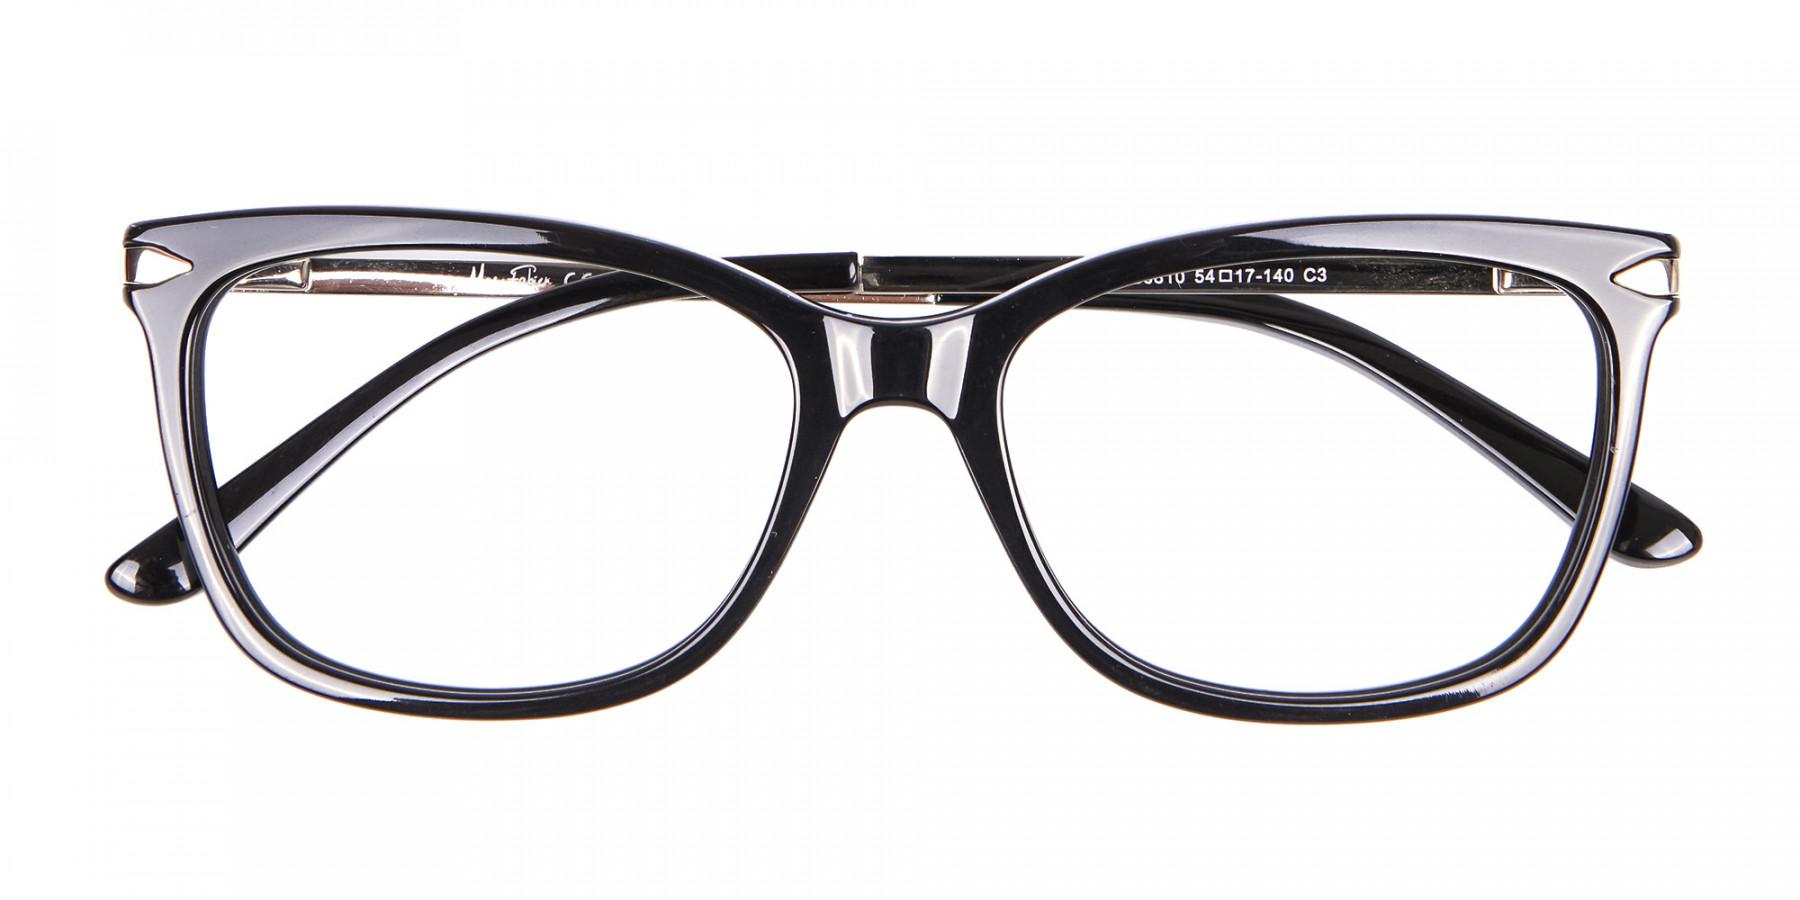 Ladies Mordern Rectangular Glasses in Black- 1